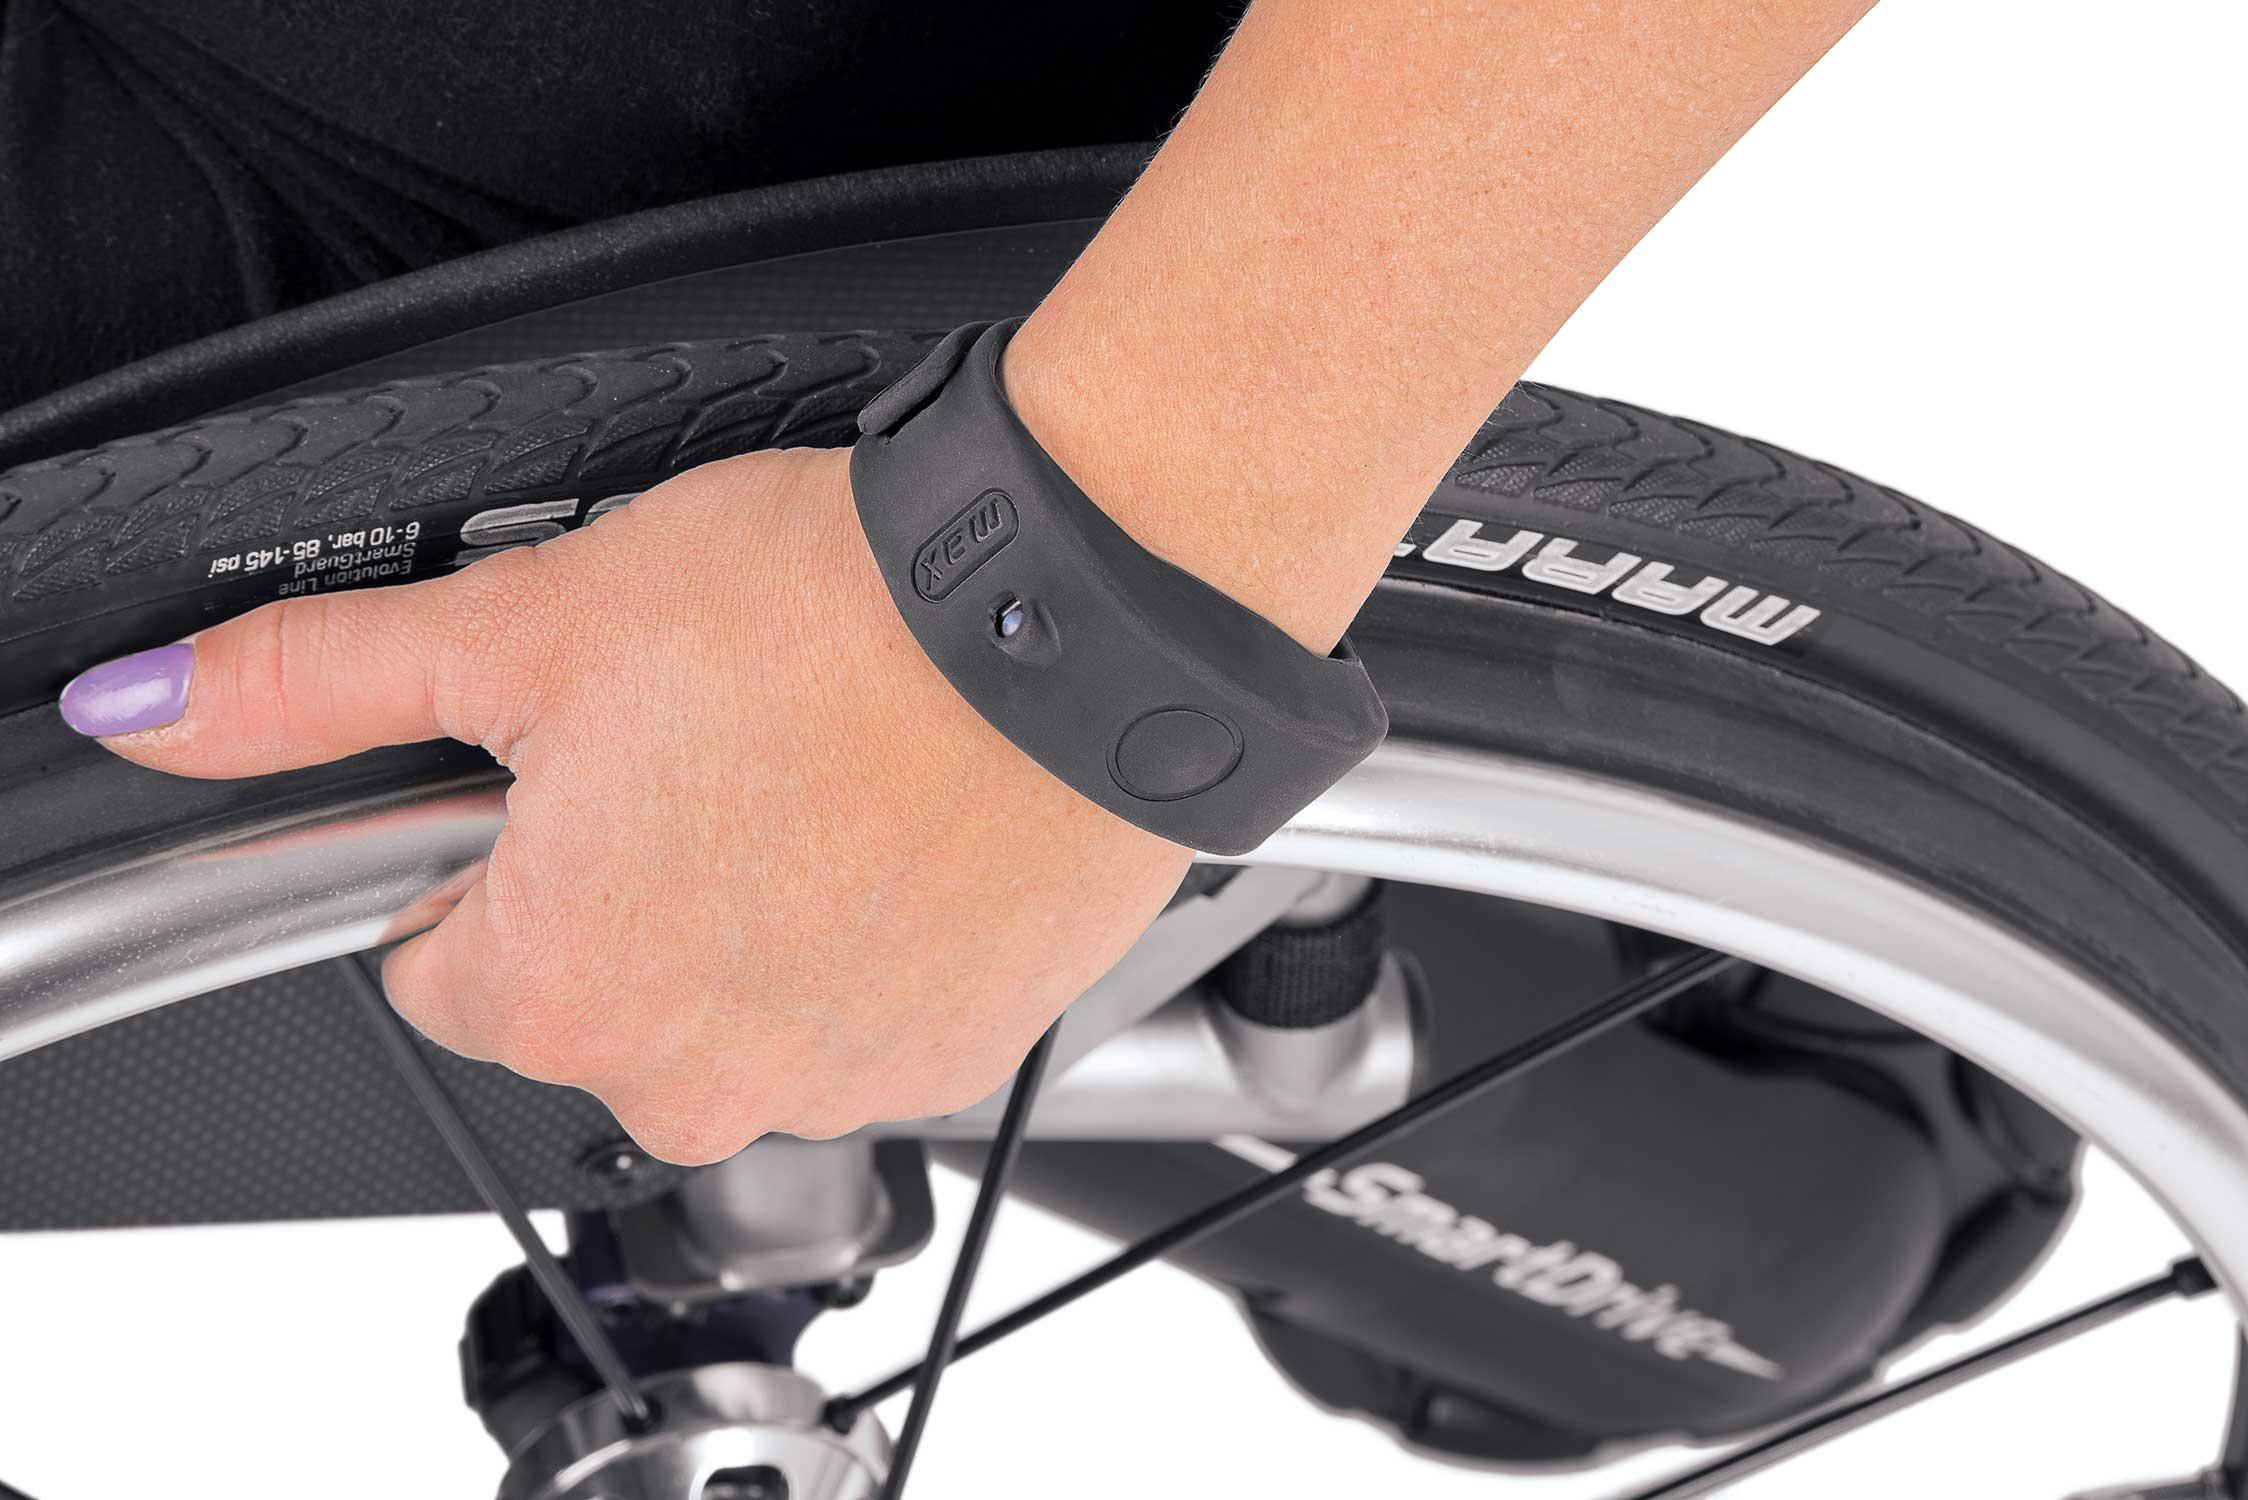 smartdrive-mx2-wrist-band.jpg